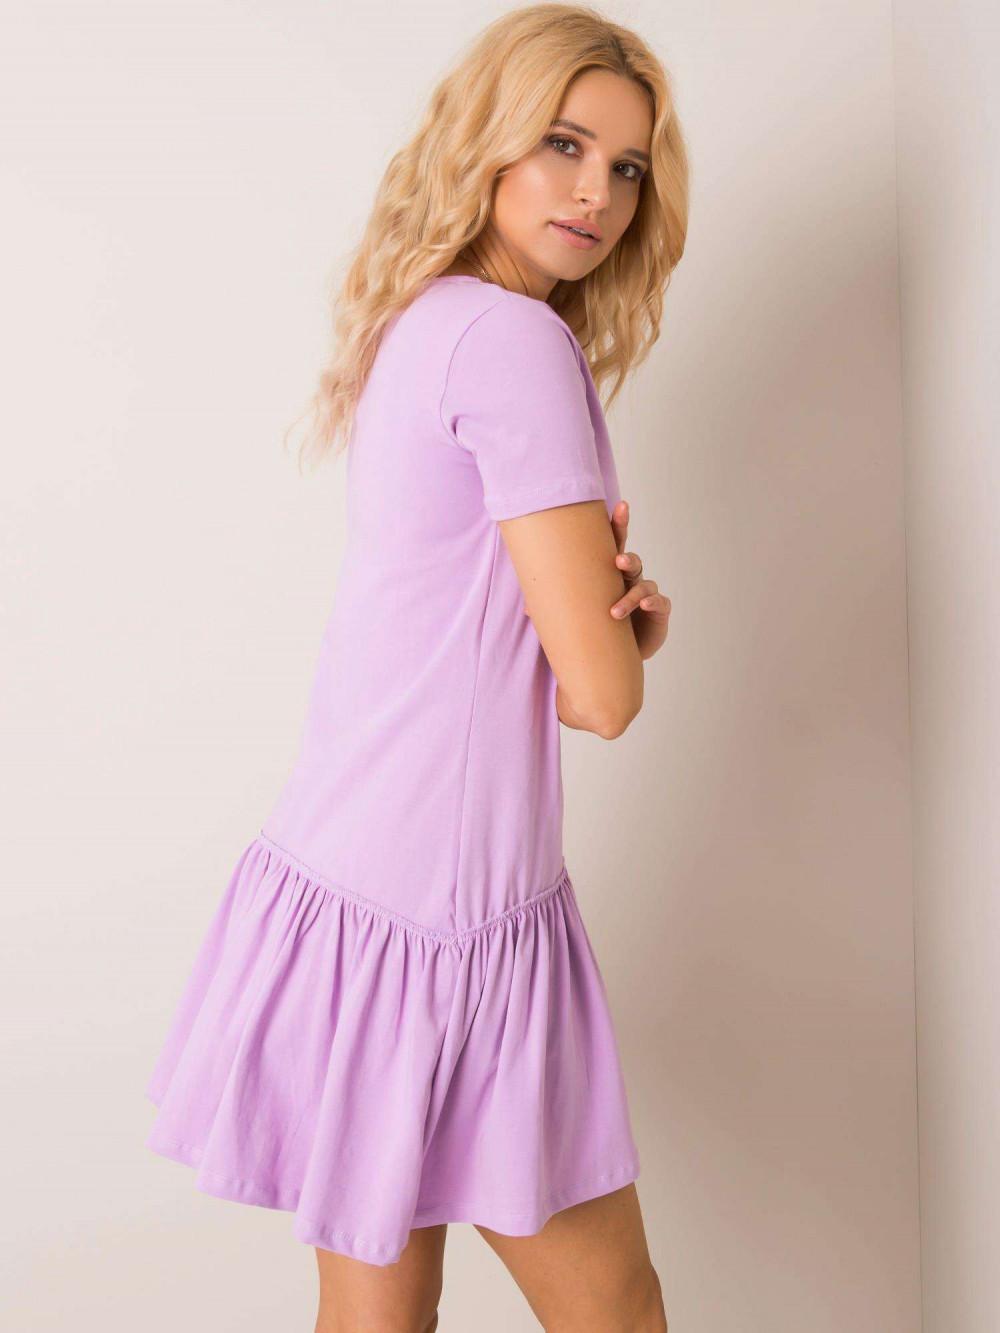 Fioletowa sukienka z falbanką Tulsa 2